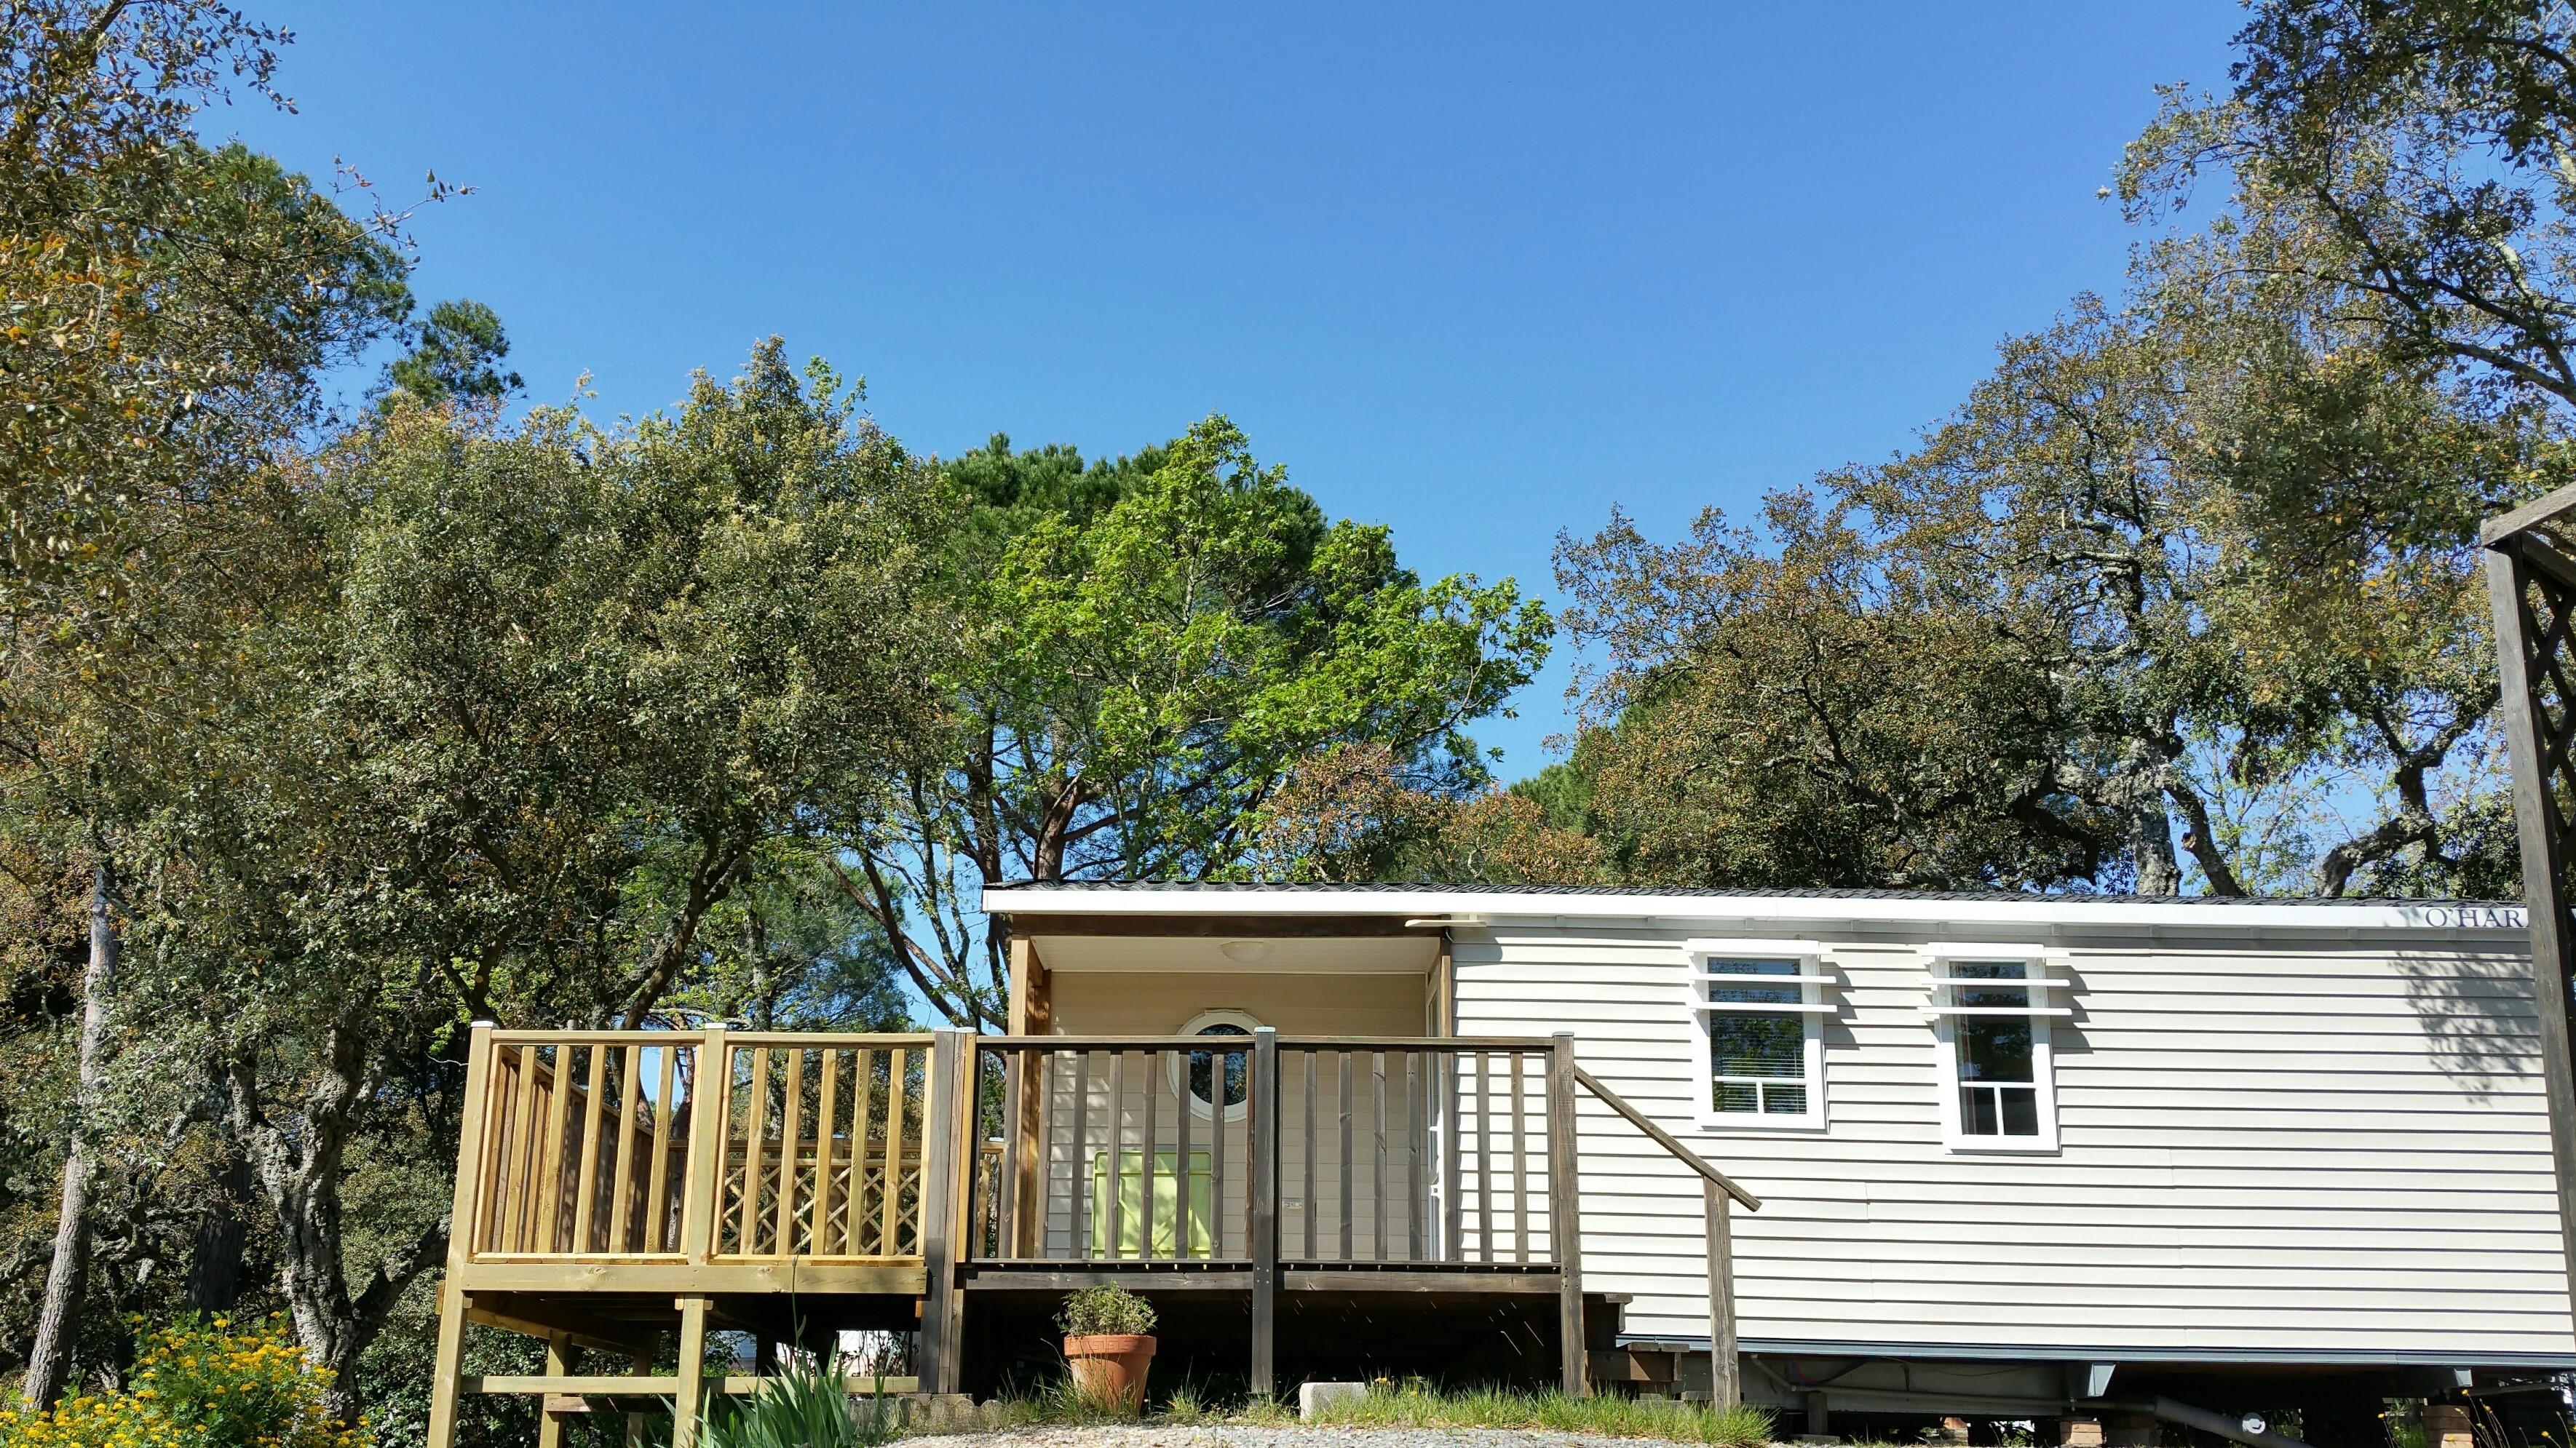 GENET    31m² - 3 chambres, climatisation,  TV, grande  terrasse